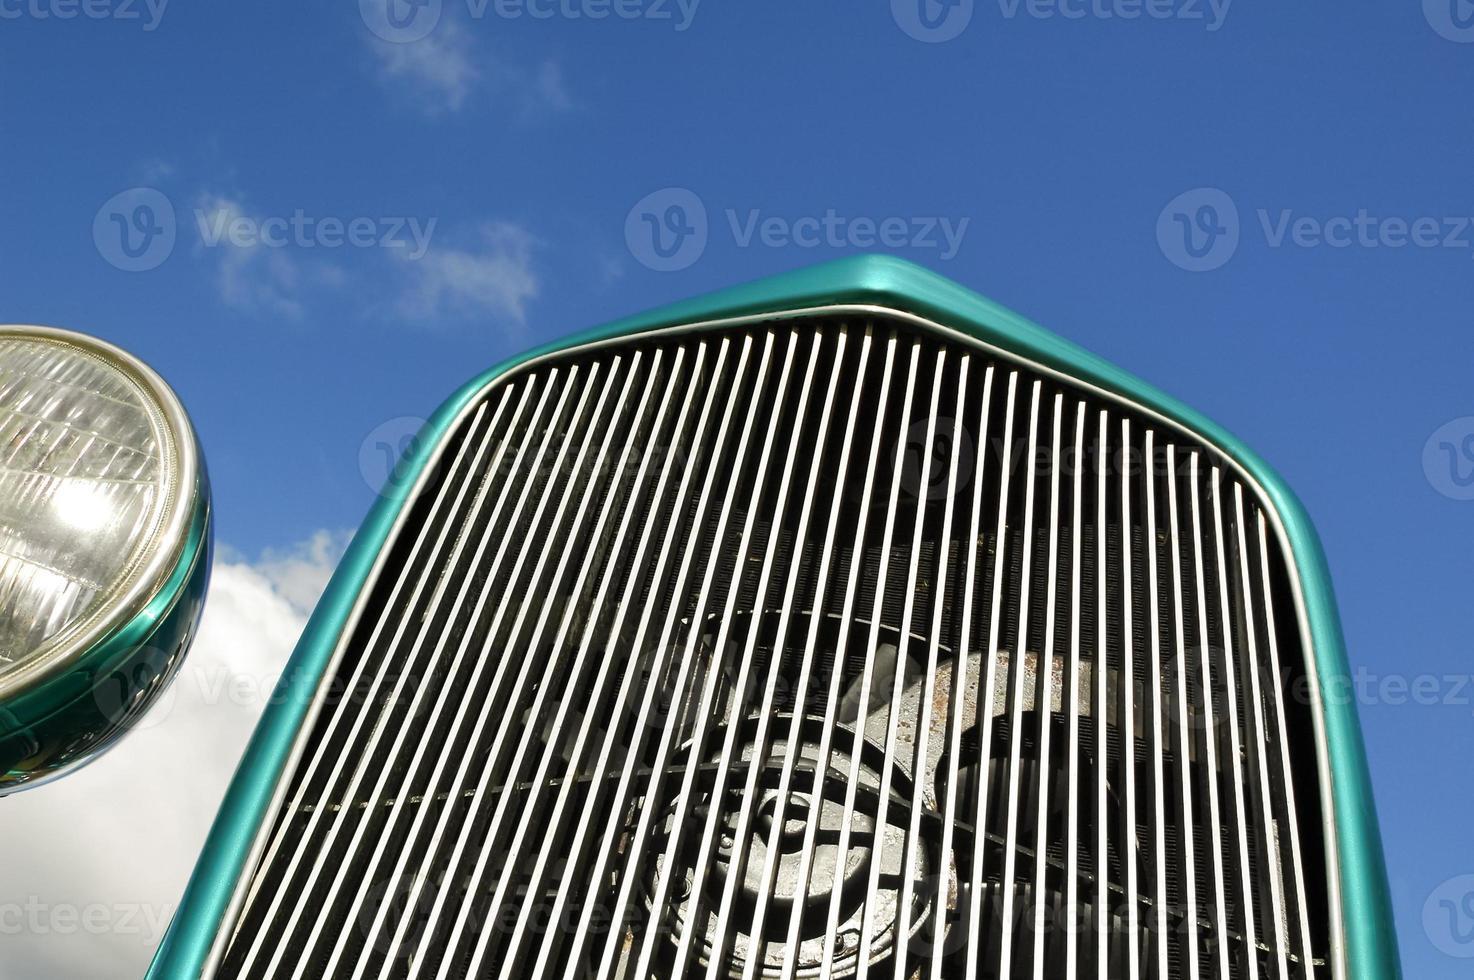 hotrod grille photo